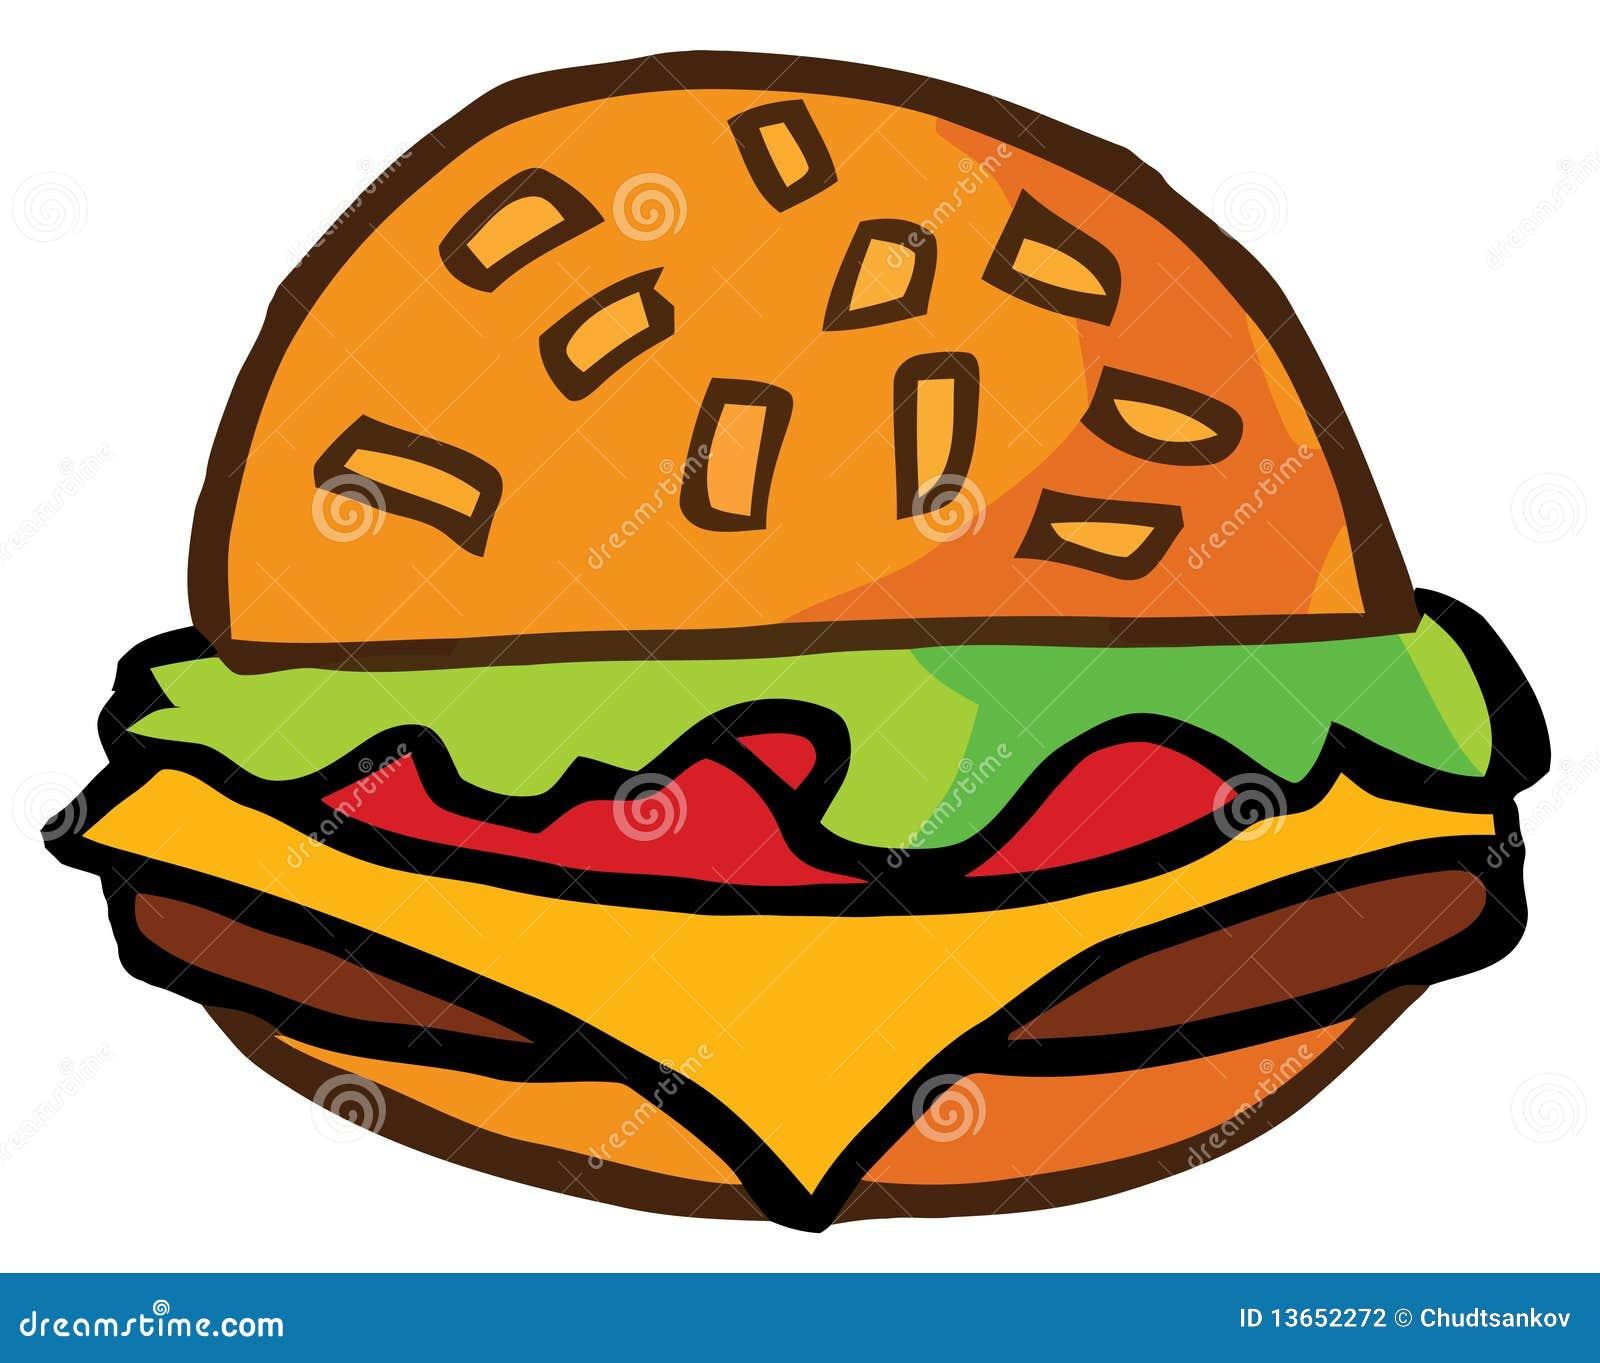 Cartoon Cheeseburger Stock Photography - Image: 13652272